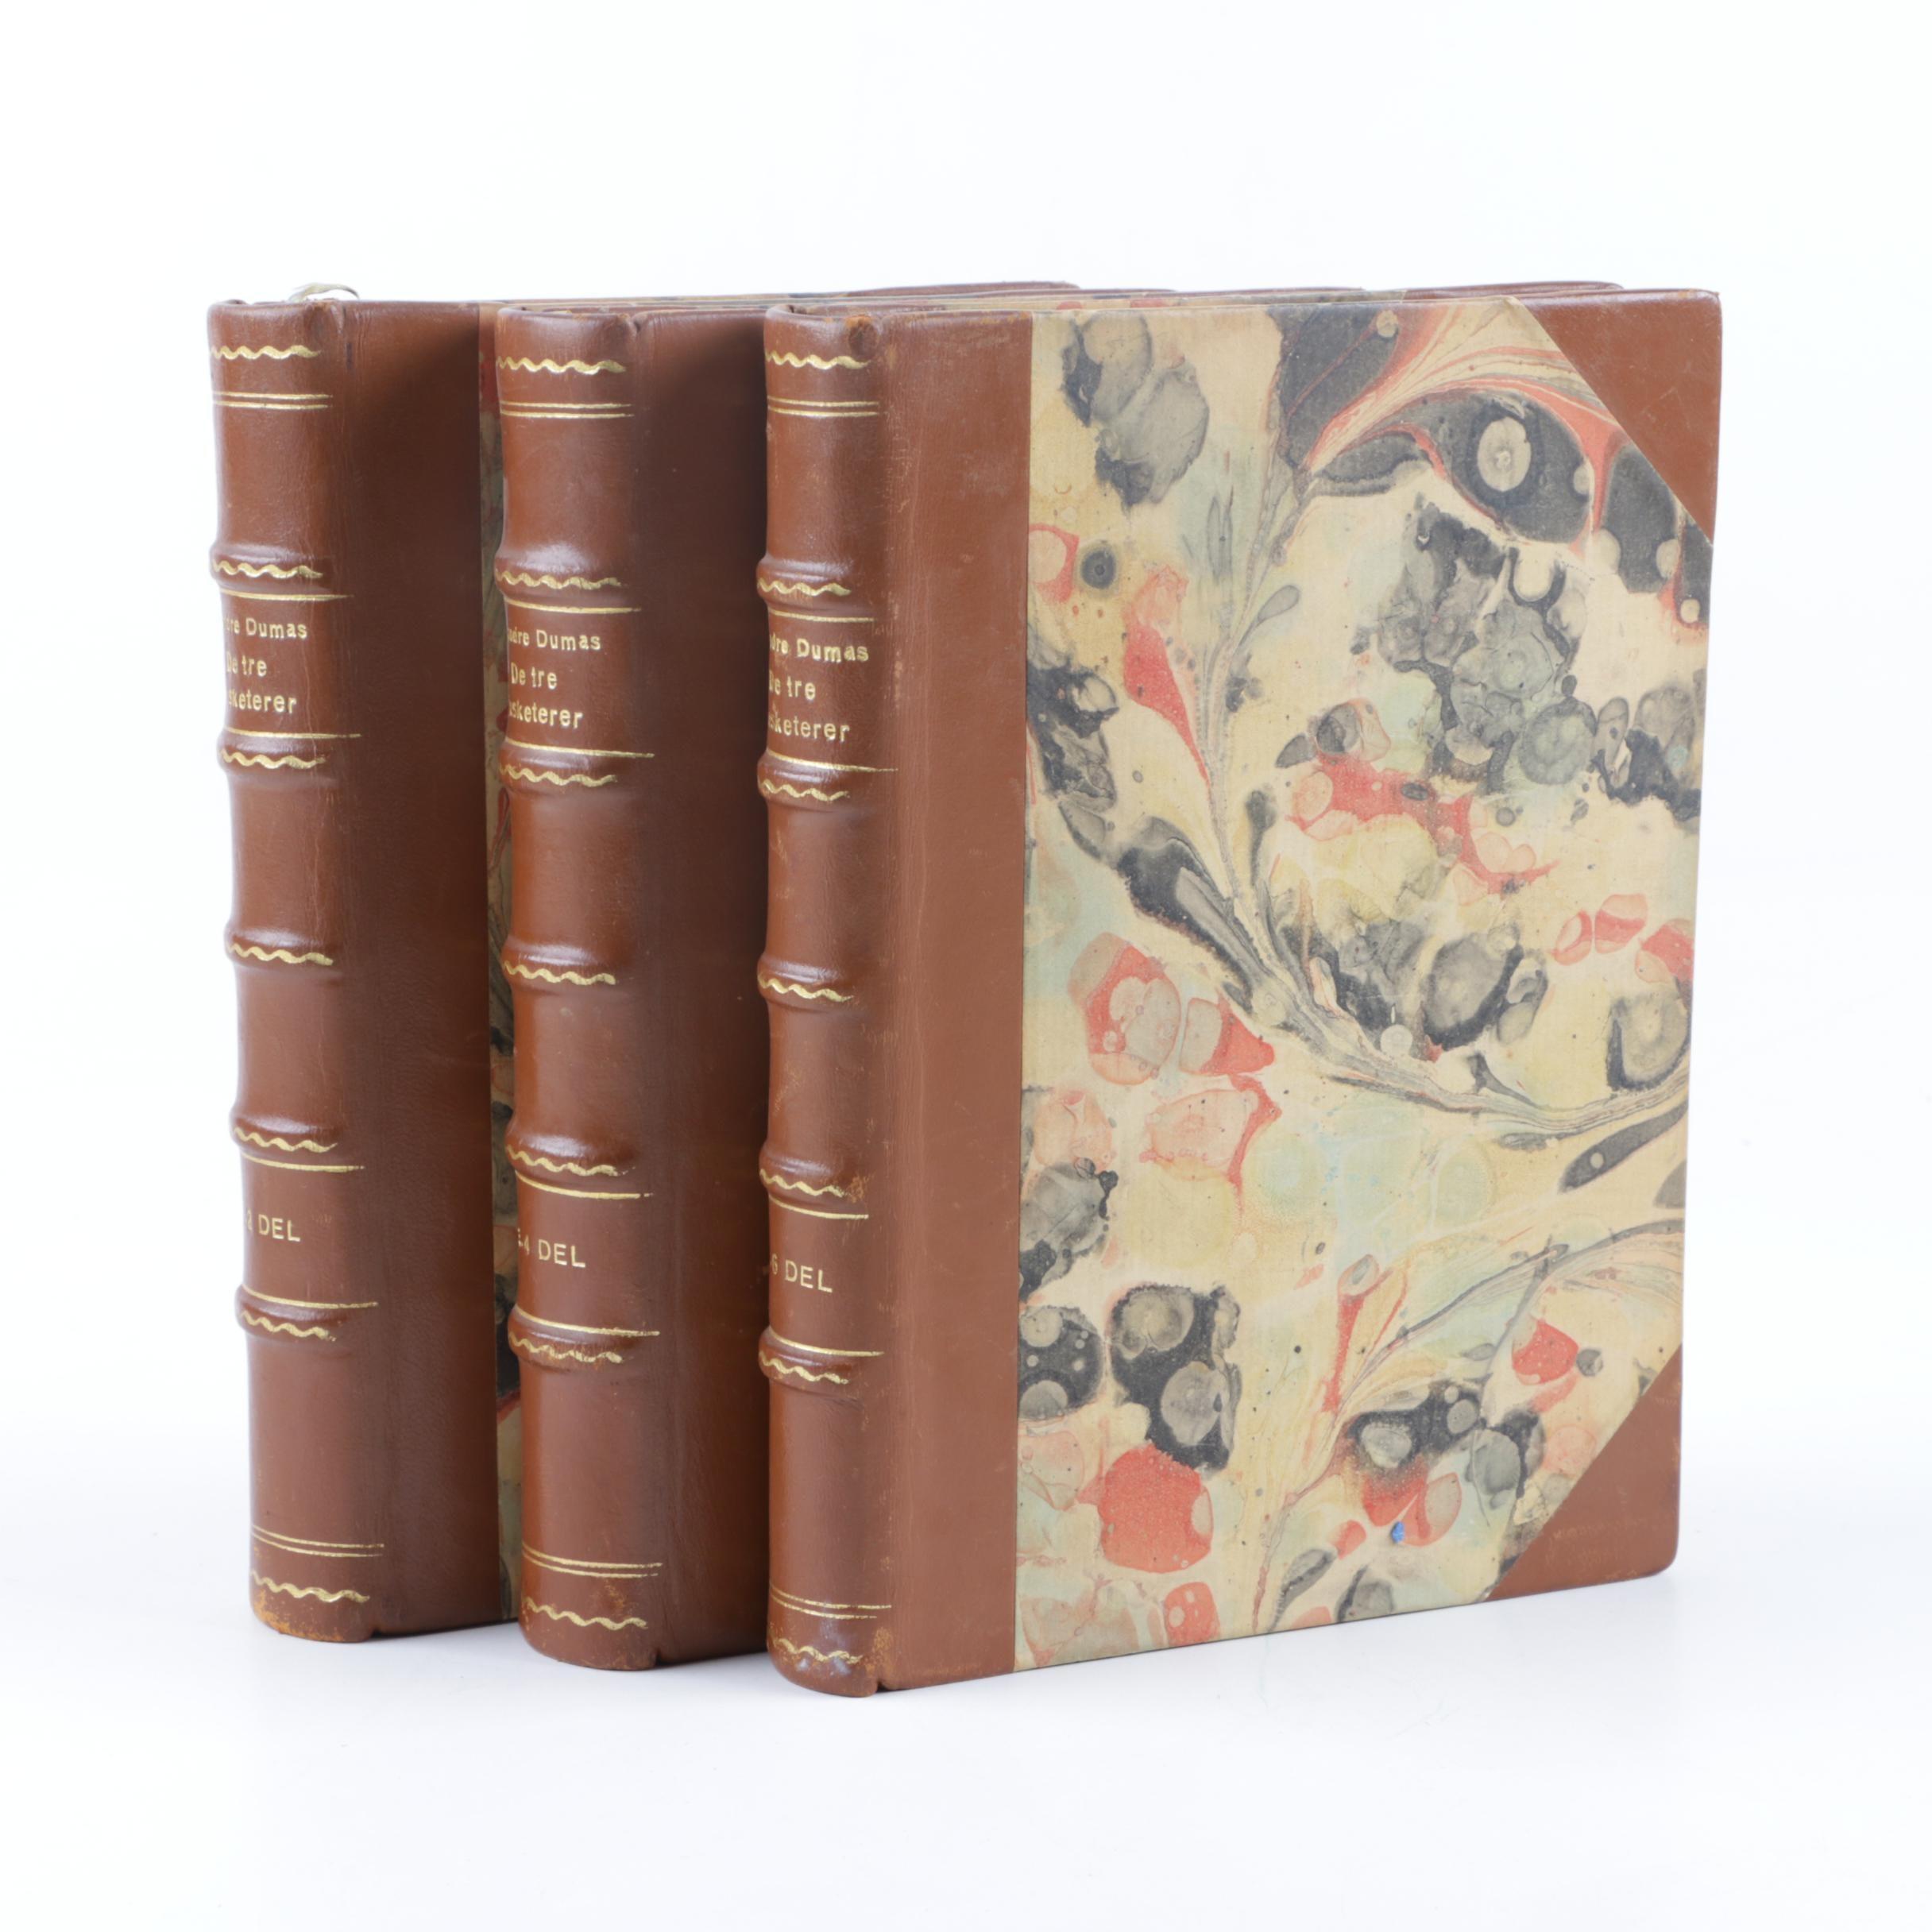 "Three-Volume Danish-Language ""De Tre Musketerer"" by Alexandre Dumas"